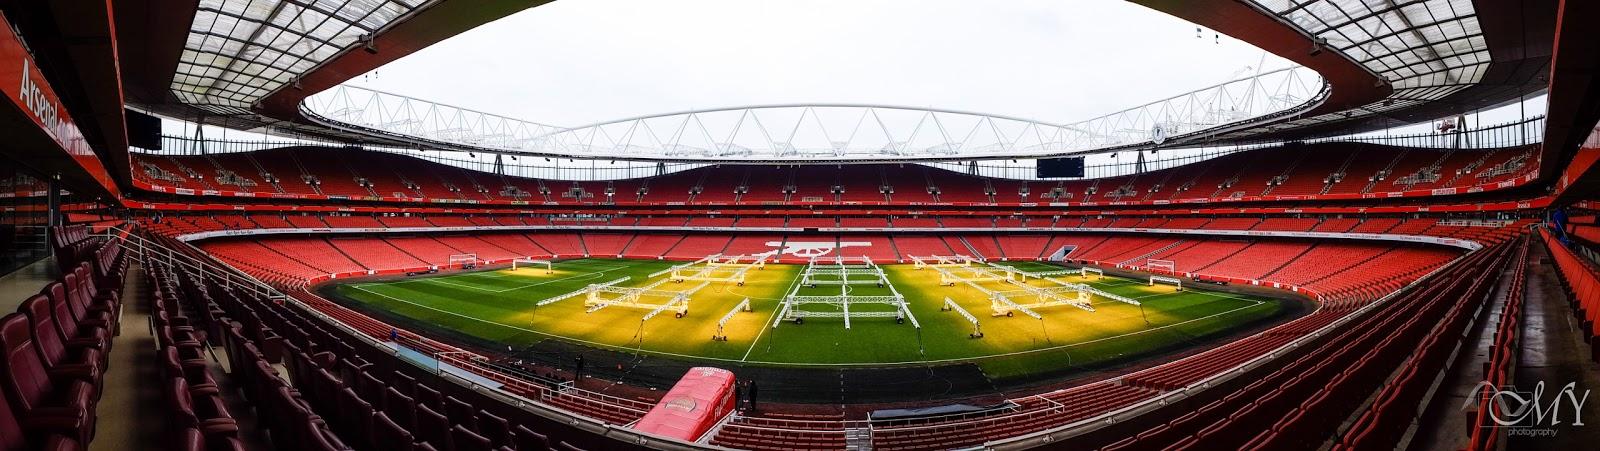 Emirates Stadium Seating Plan View View of Emirates Stadium